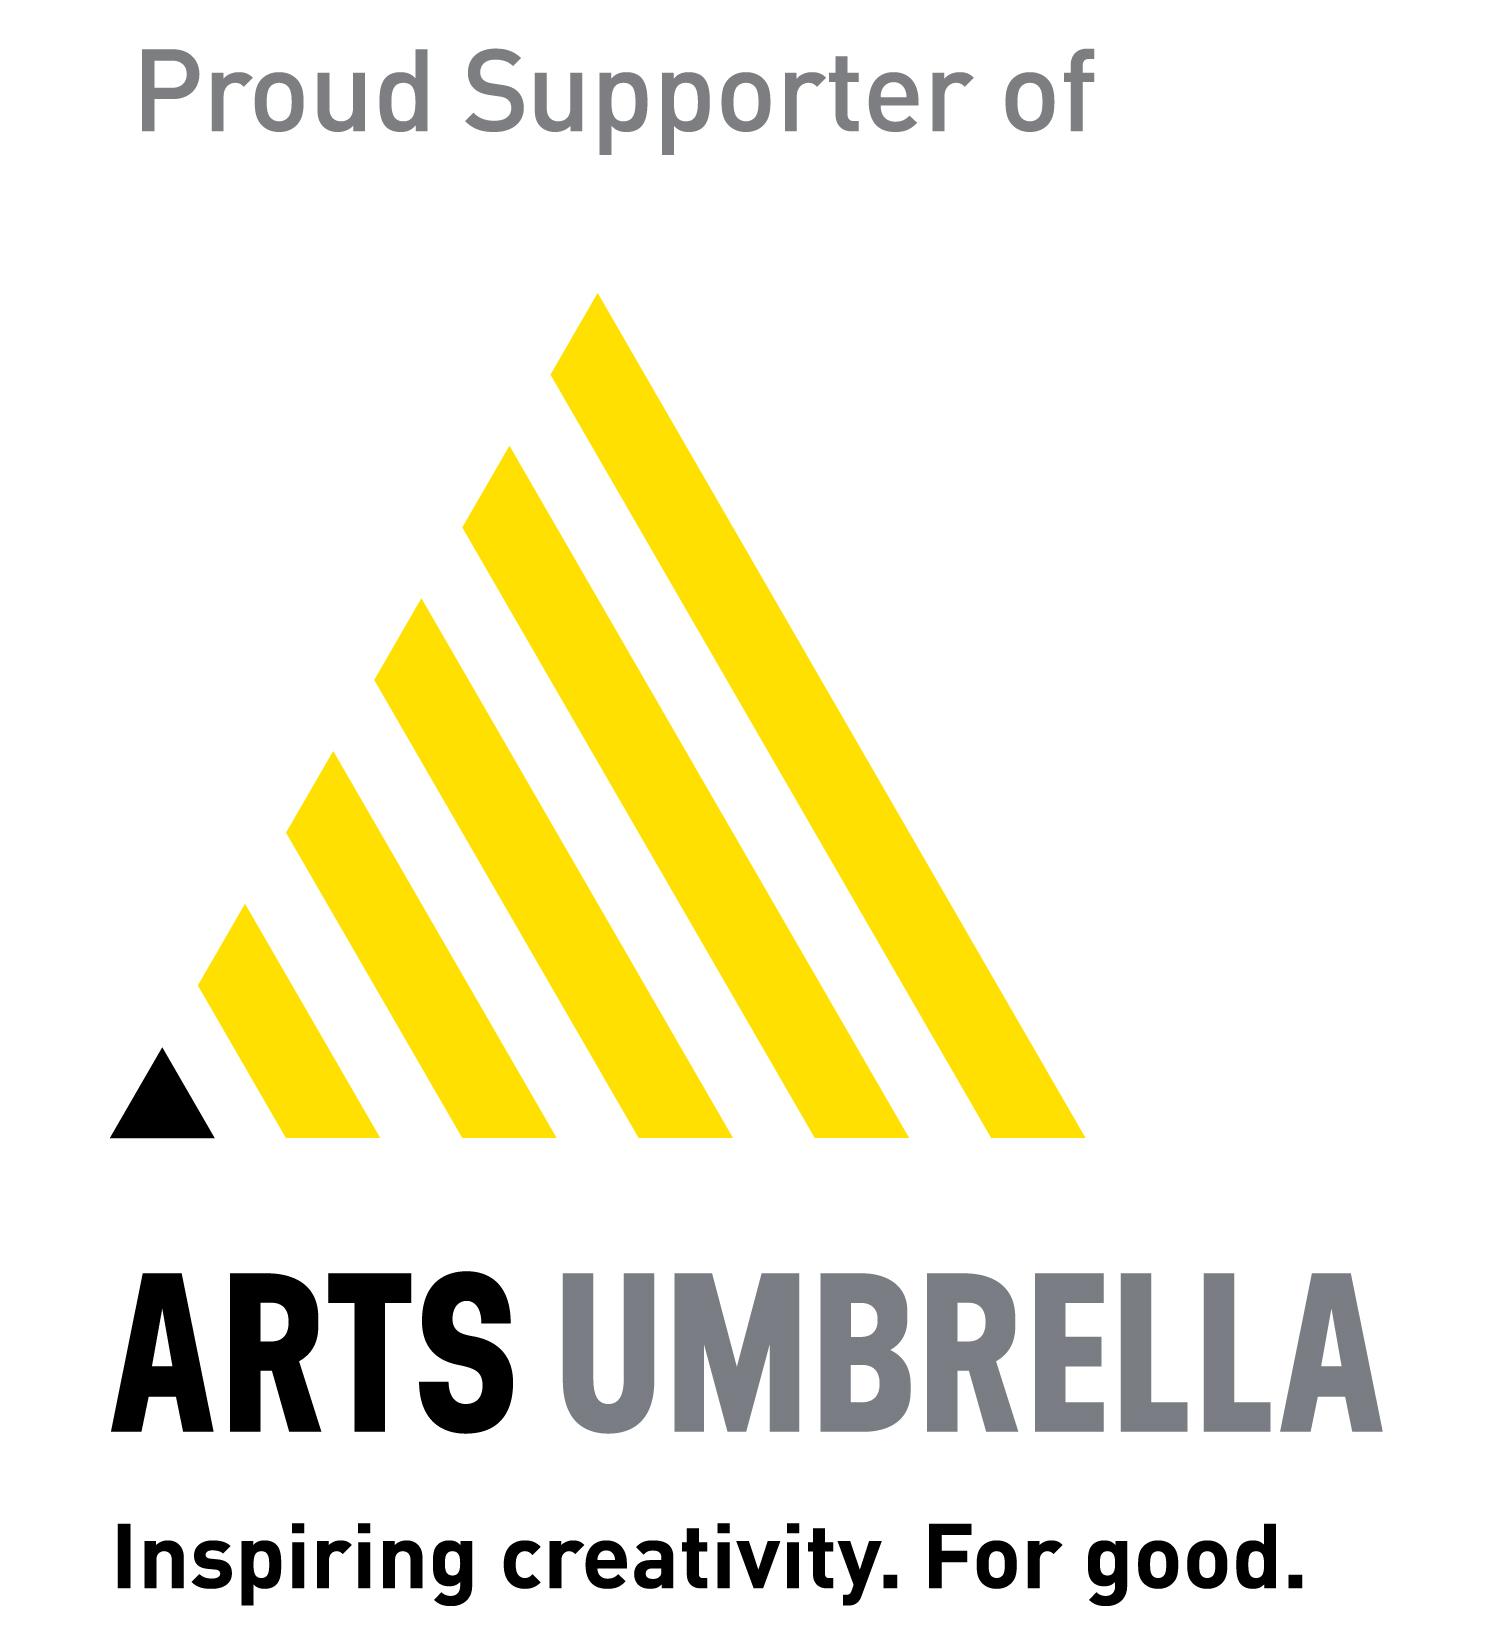 savoury-chef-arts-umbrella-supporter-logo-2